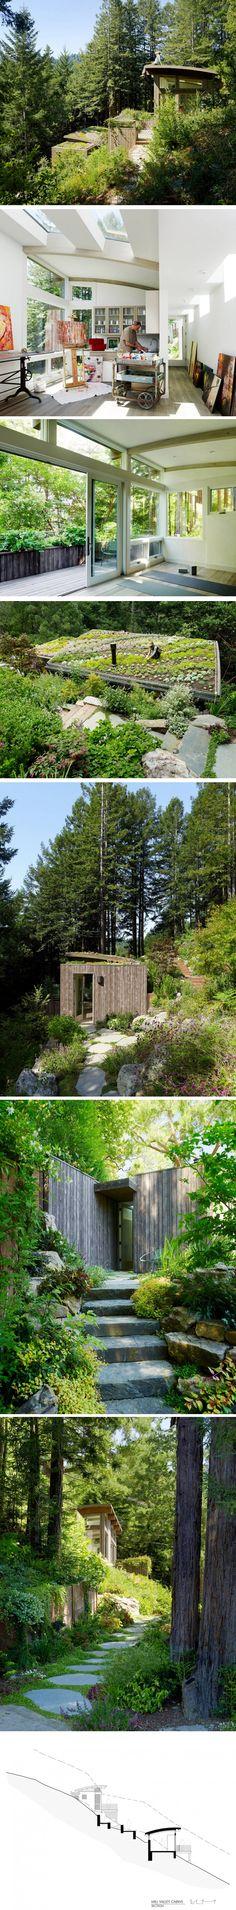 Mill Valley Cabins par Feldman Architecture